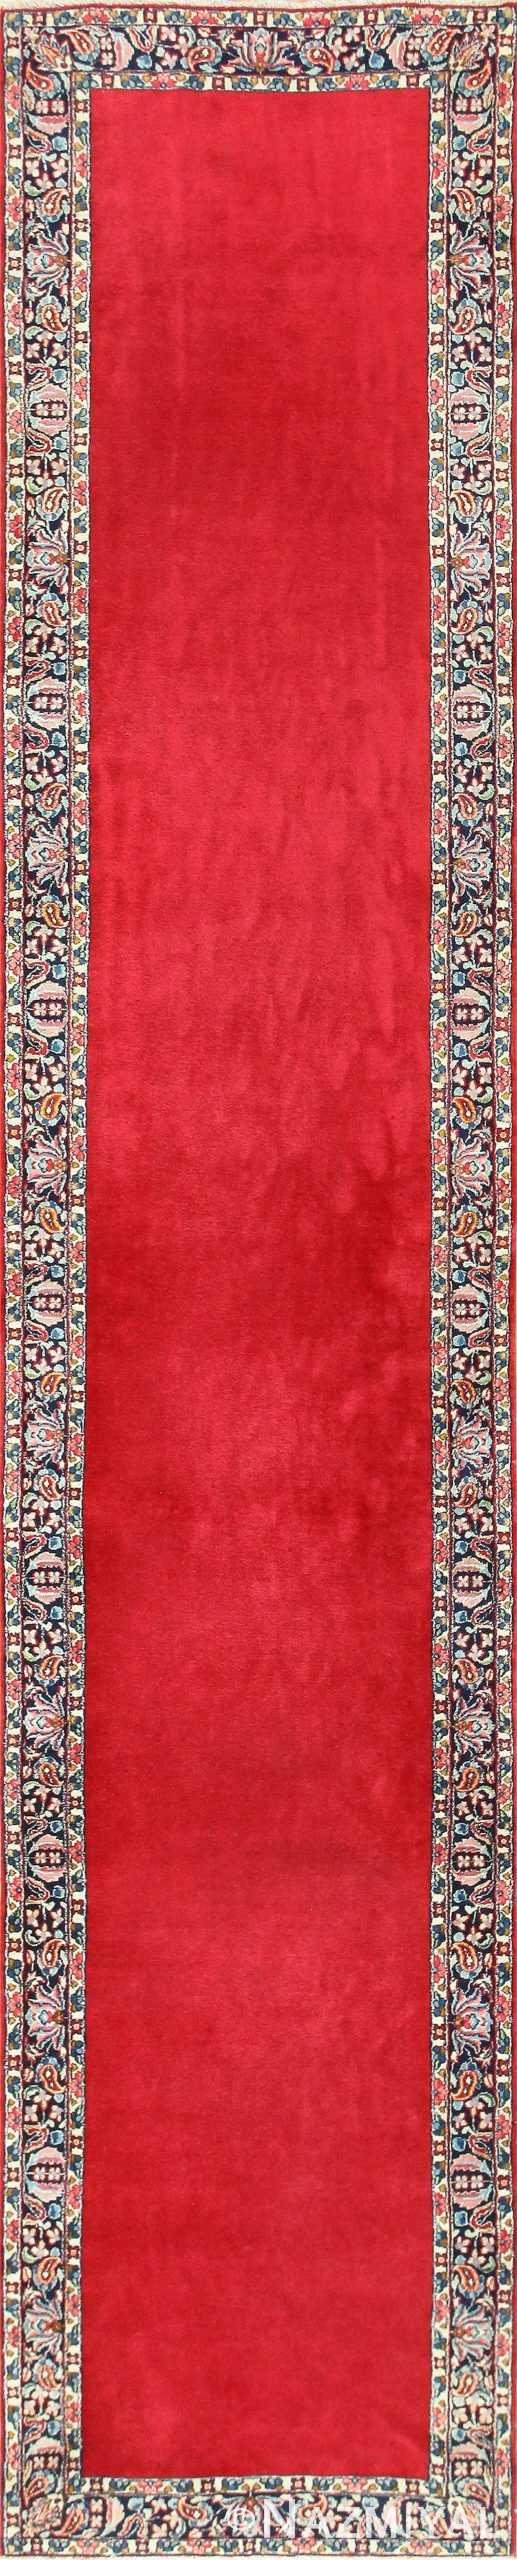 Antique Persian Floral Kerman Rug 50349 Nazmiyal